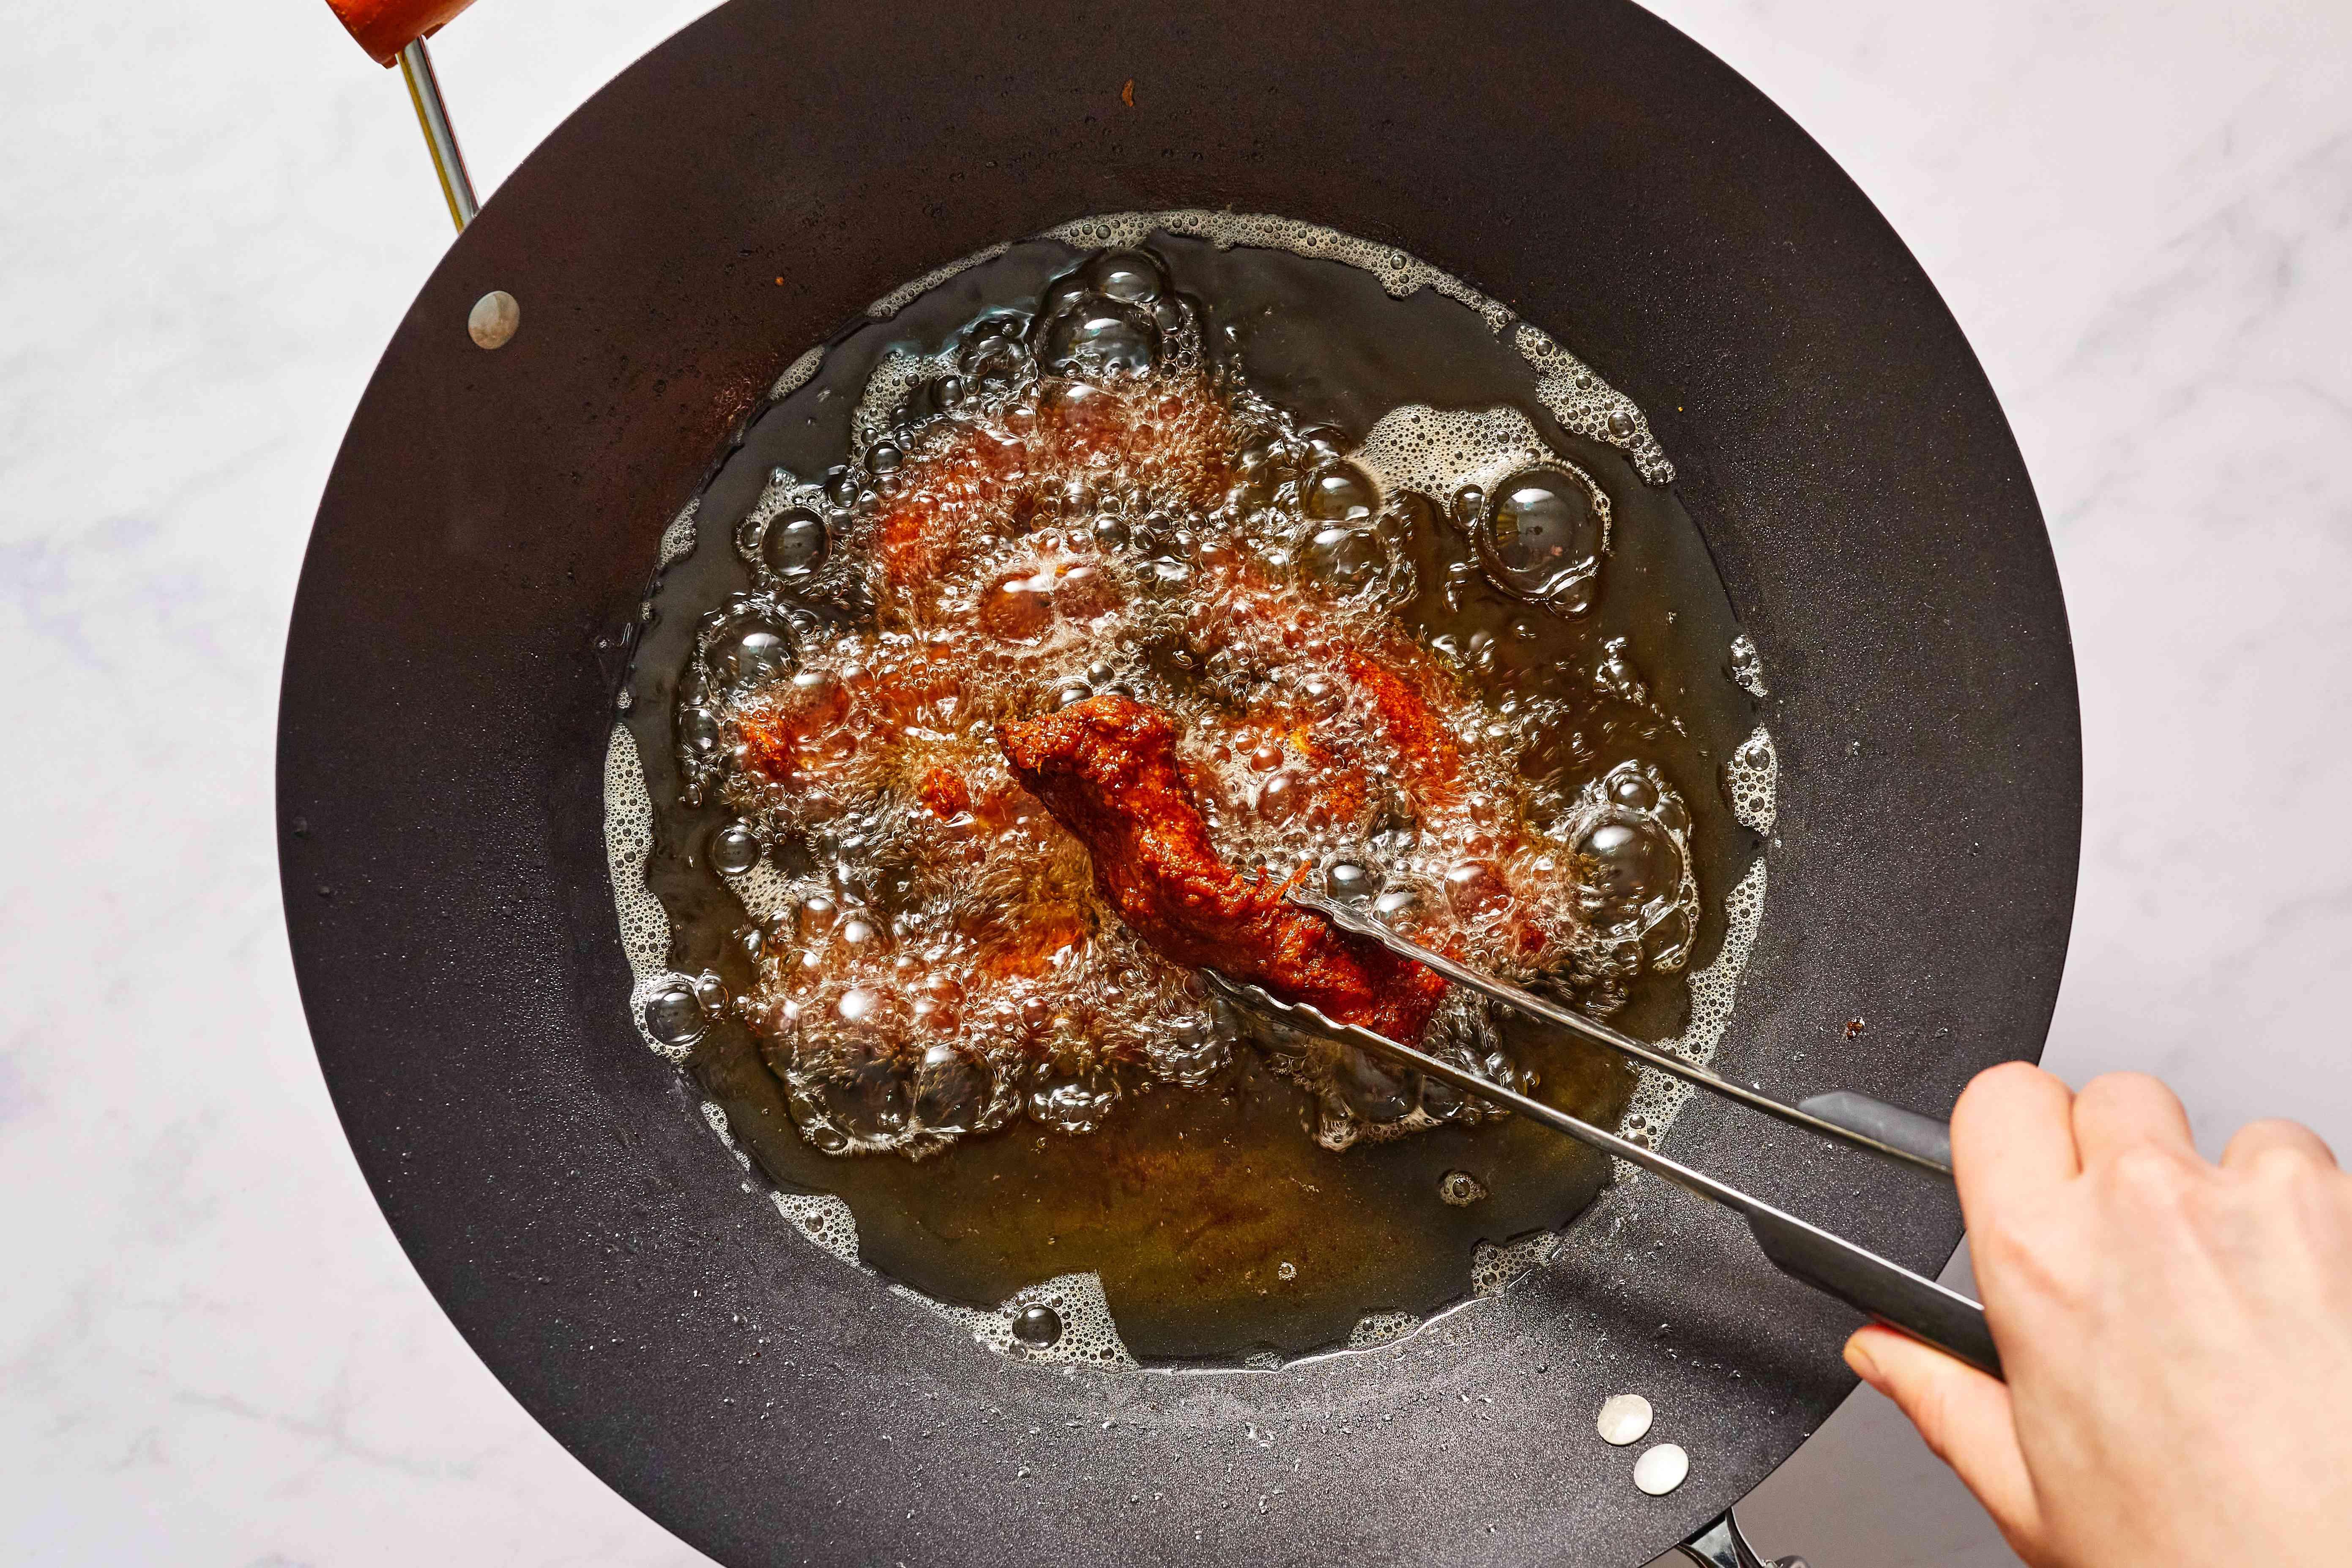 deep fry the spareribs in a pot